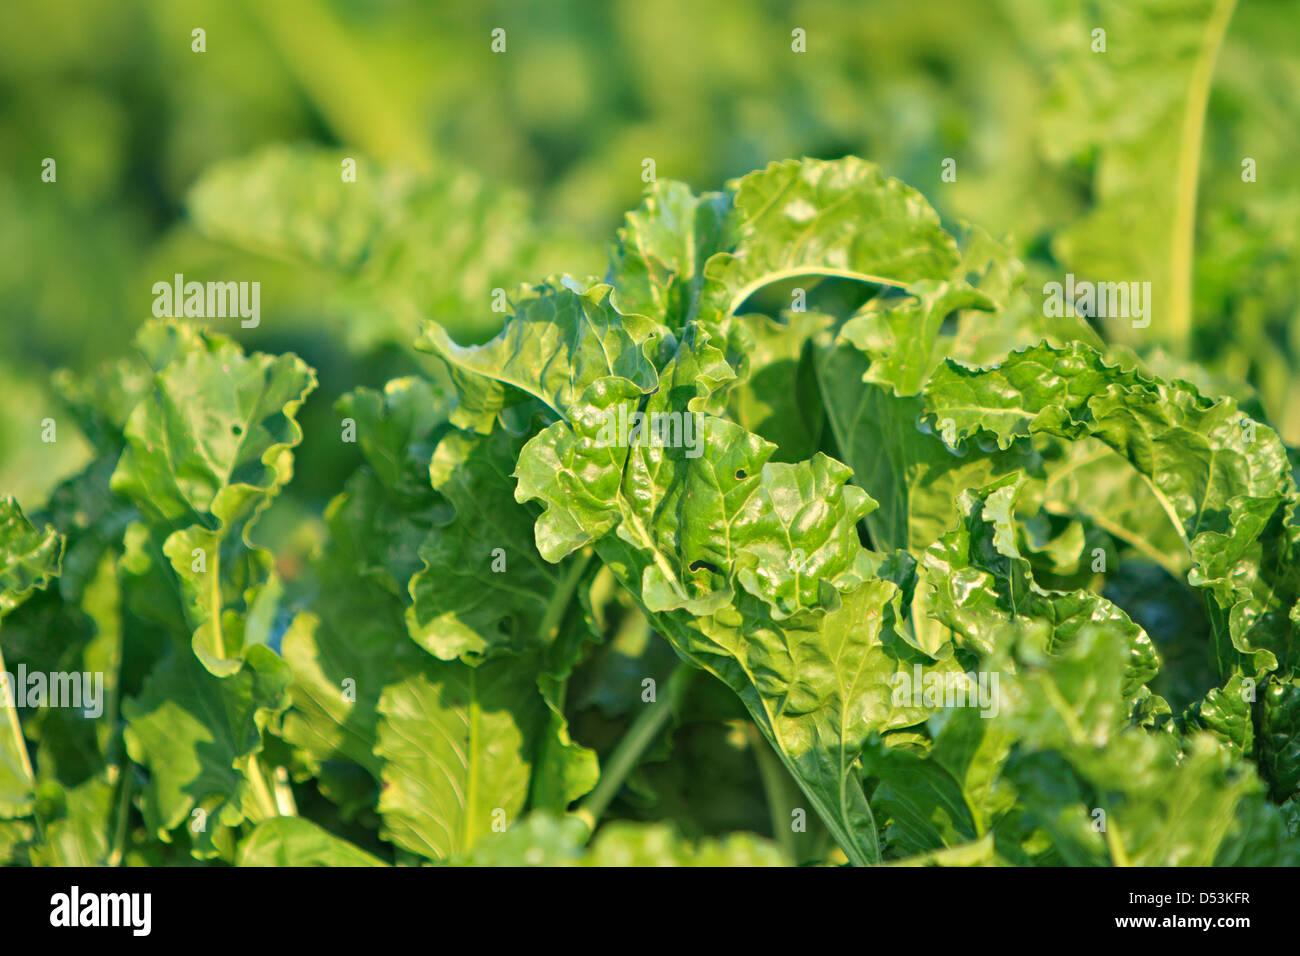 Sugar beet, cultivated Beta vulgaris - Stock Image